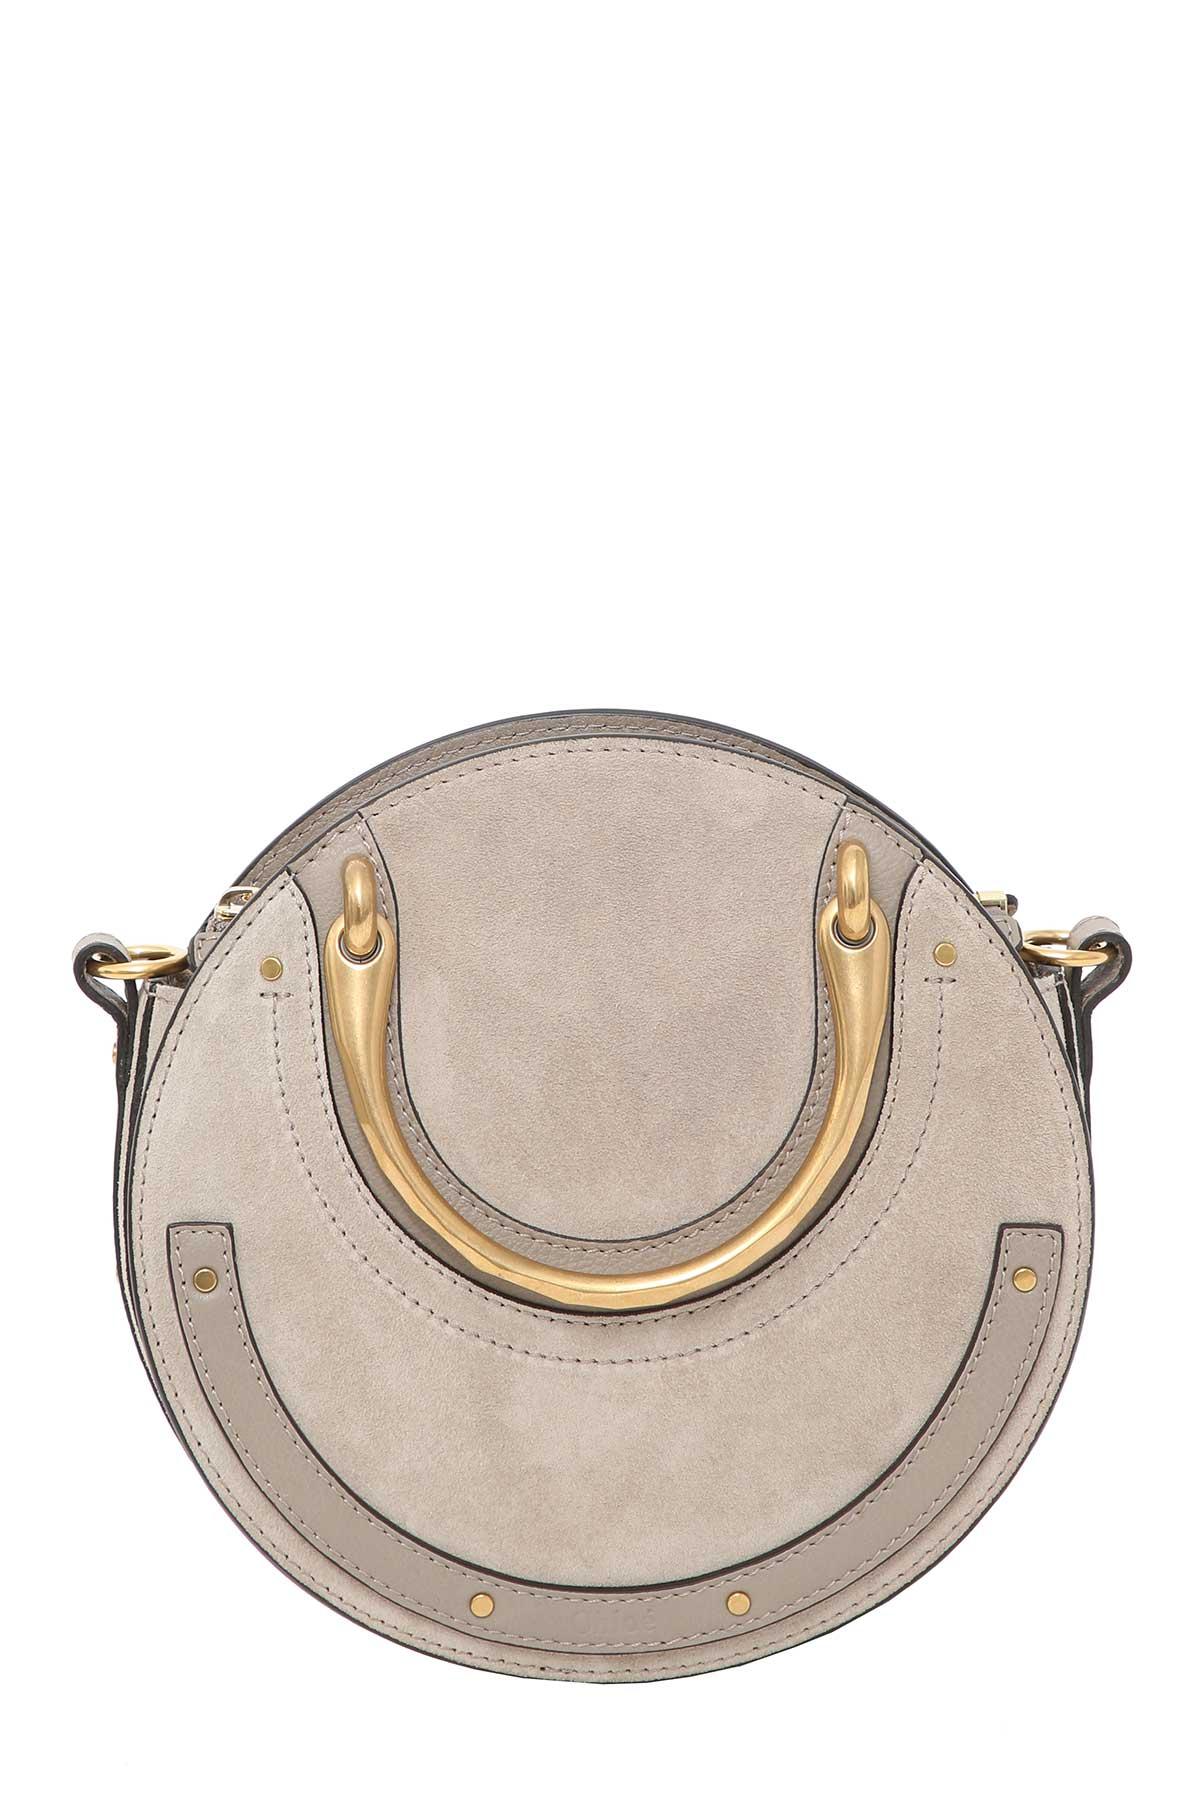 Chloé Chloé Suede pixie Small Bag